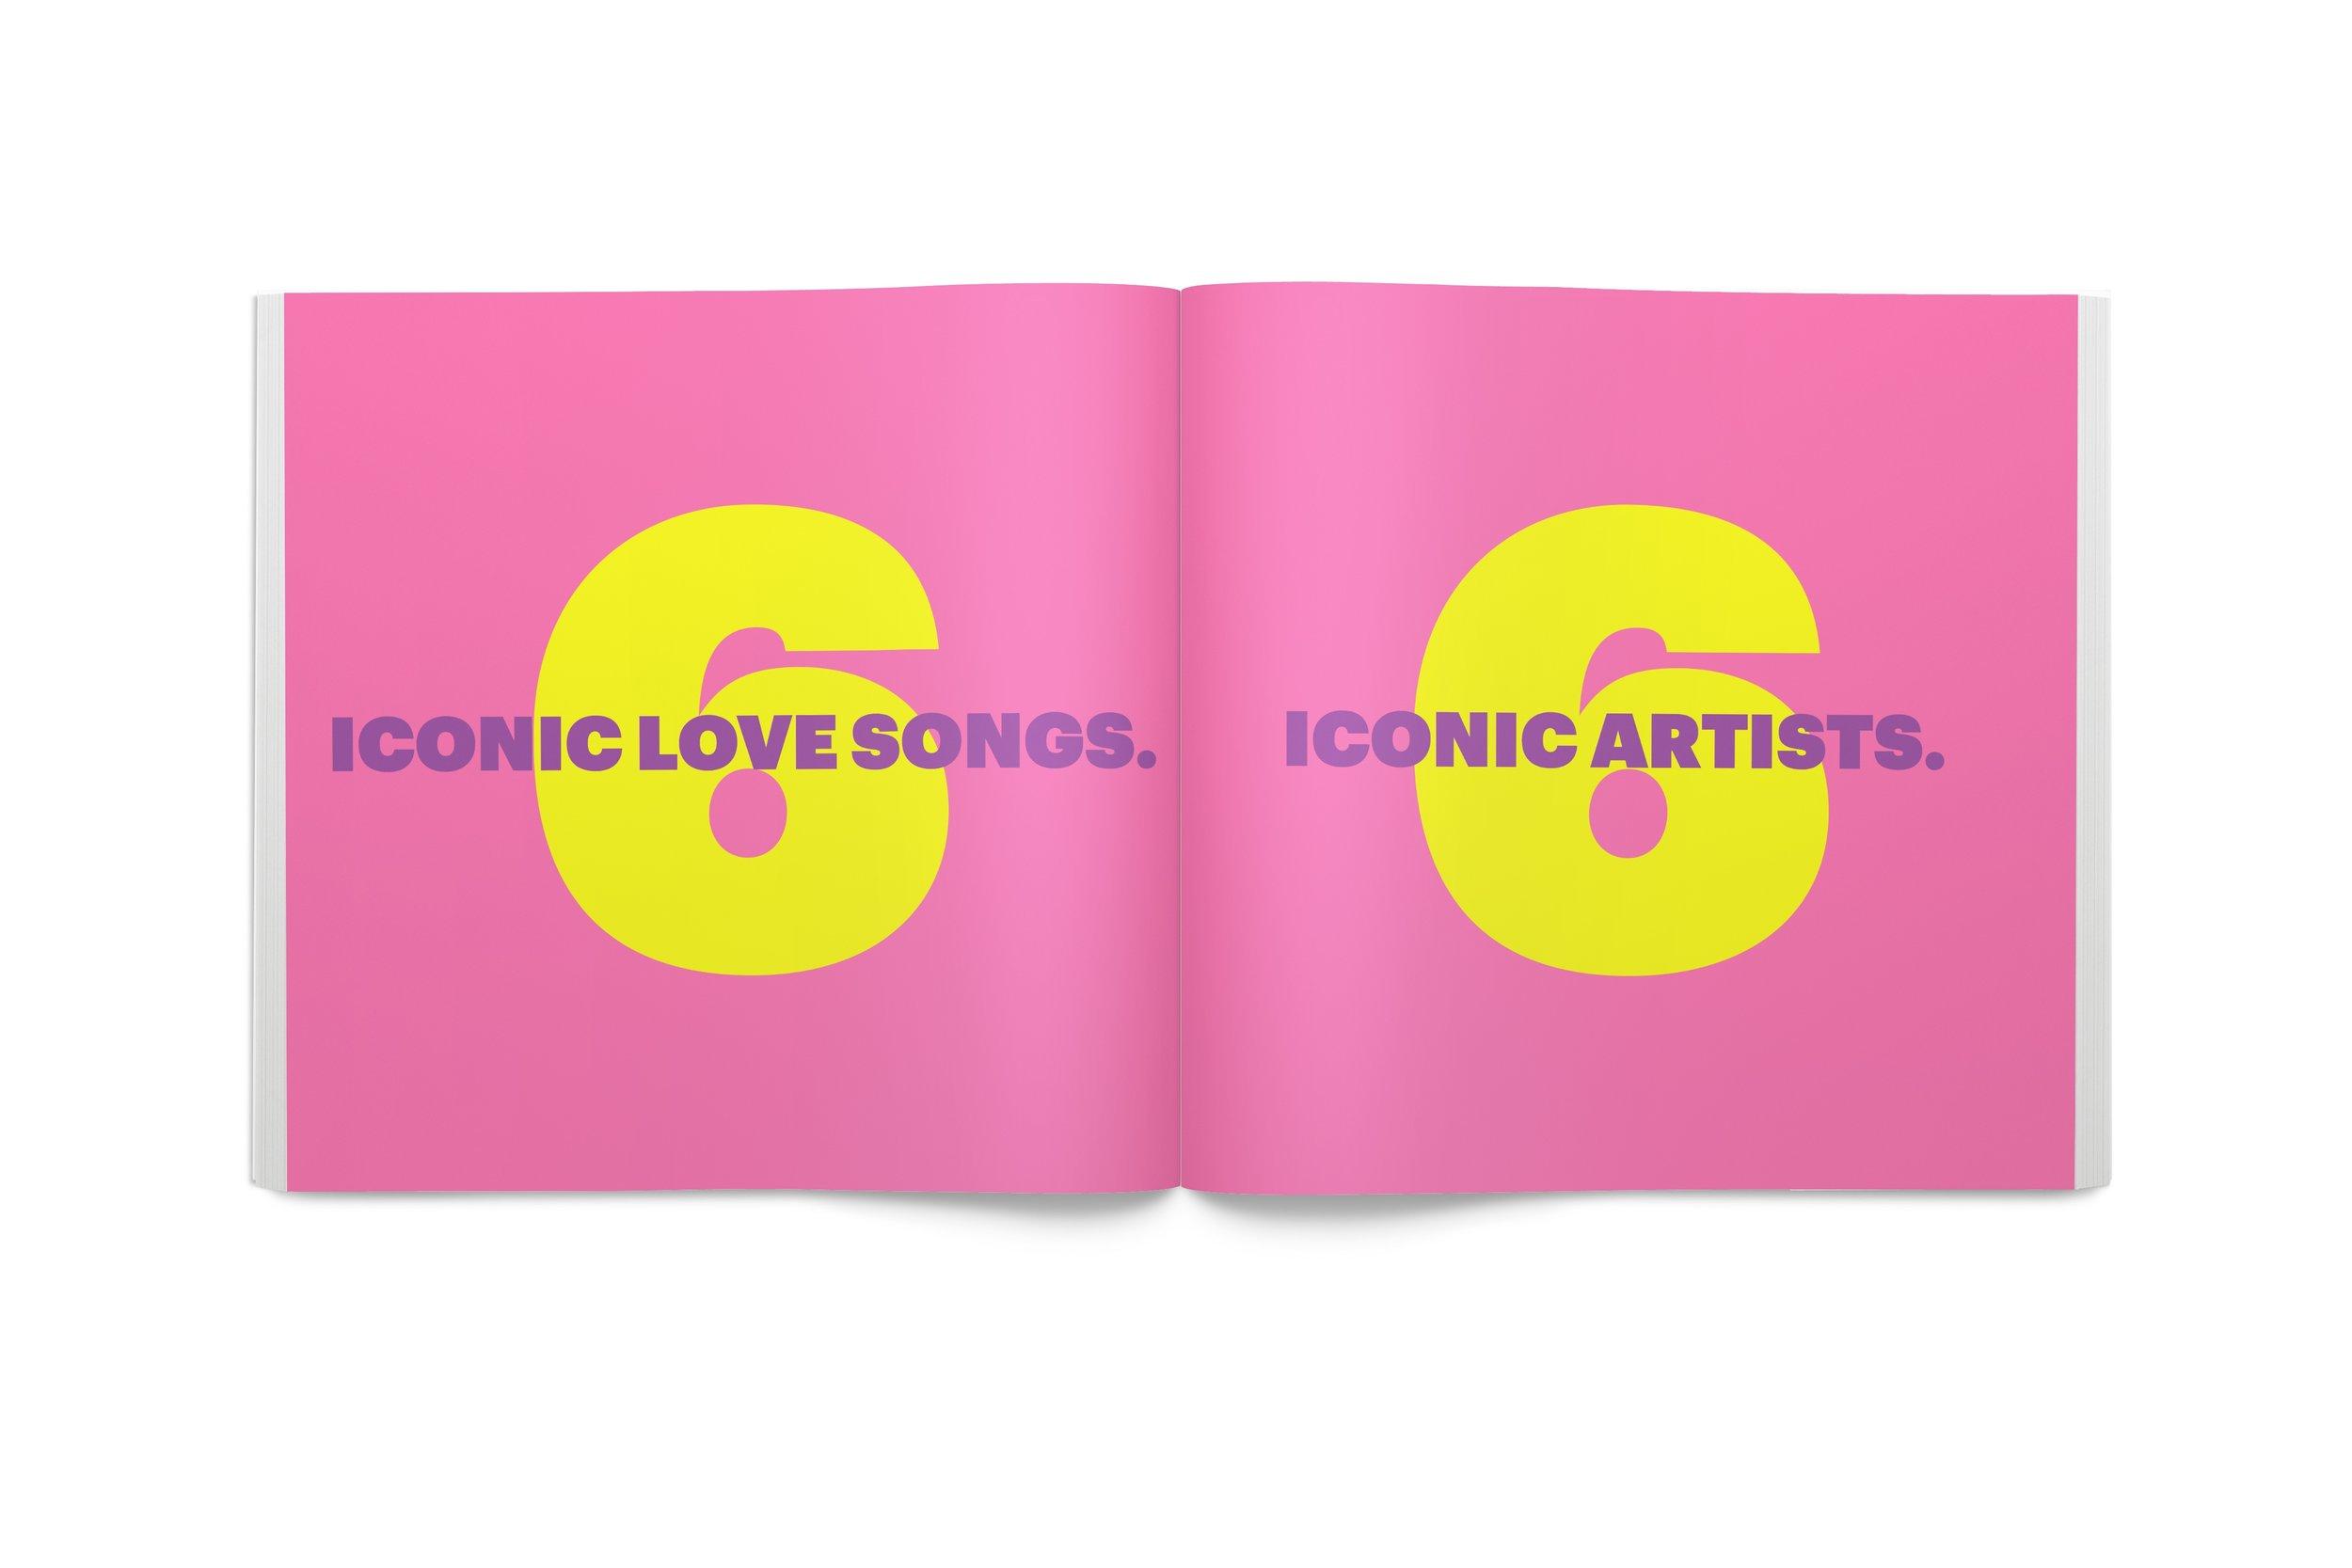 Magazine 0406 2018-07-09 copy 8.jpeg